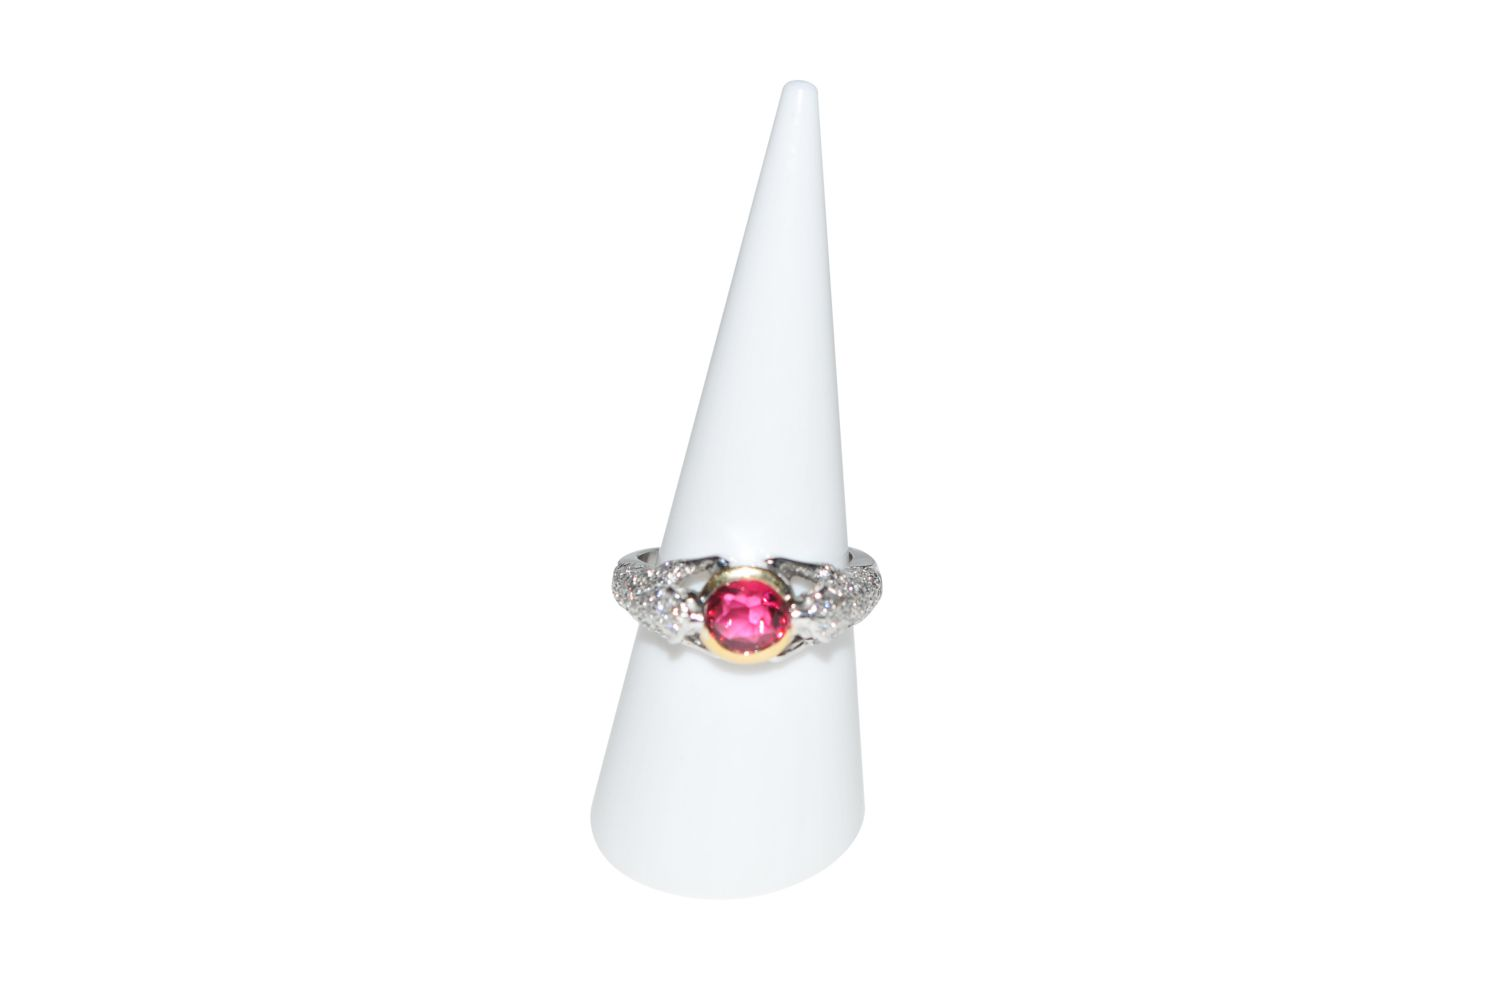 #93 Brilliant ring with tourmaline | Brillantring mit Turmalin Image